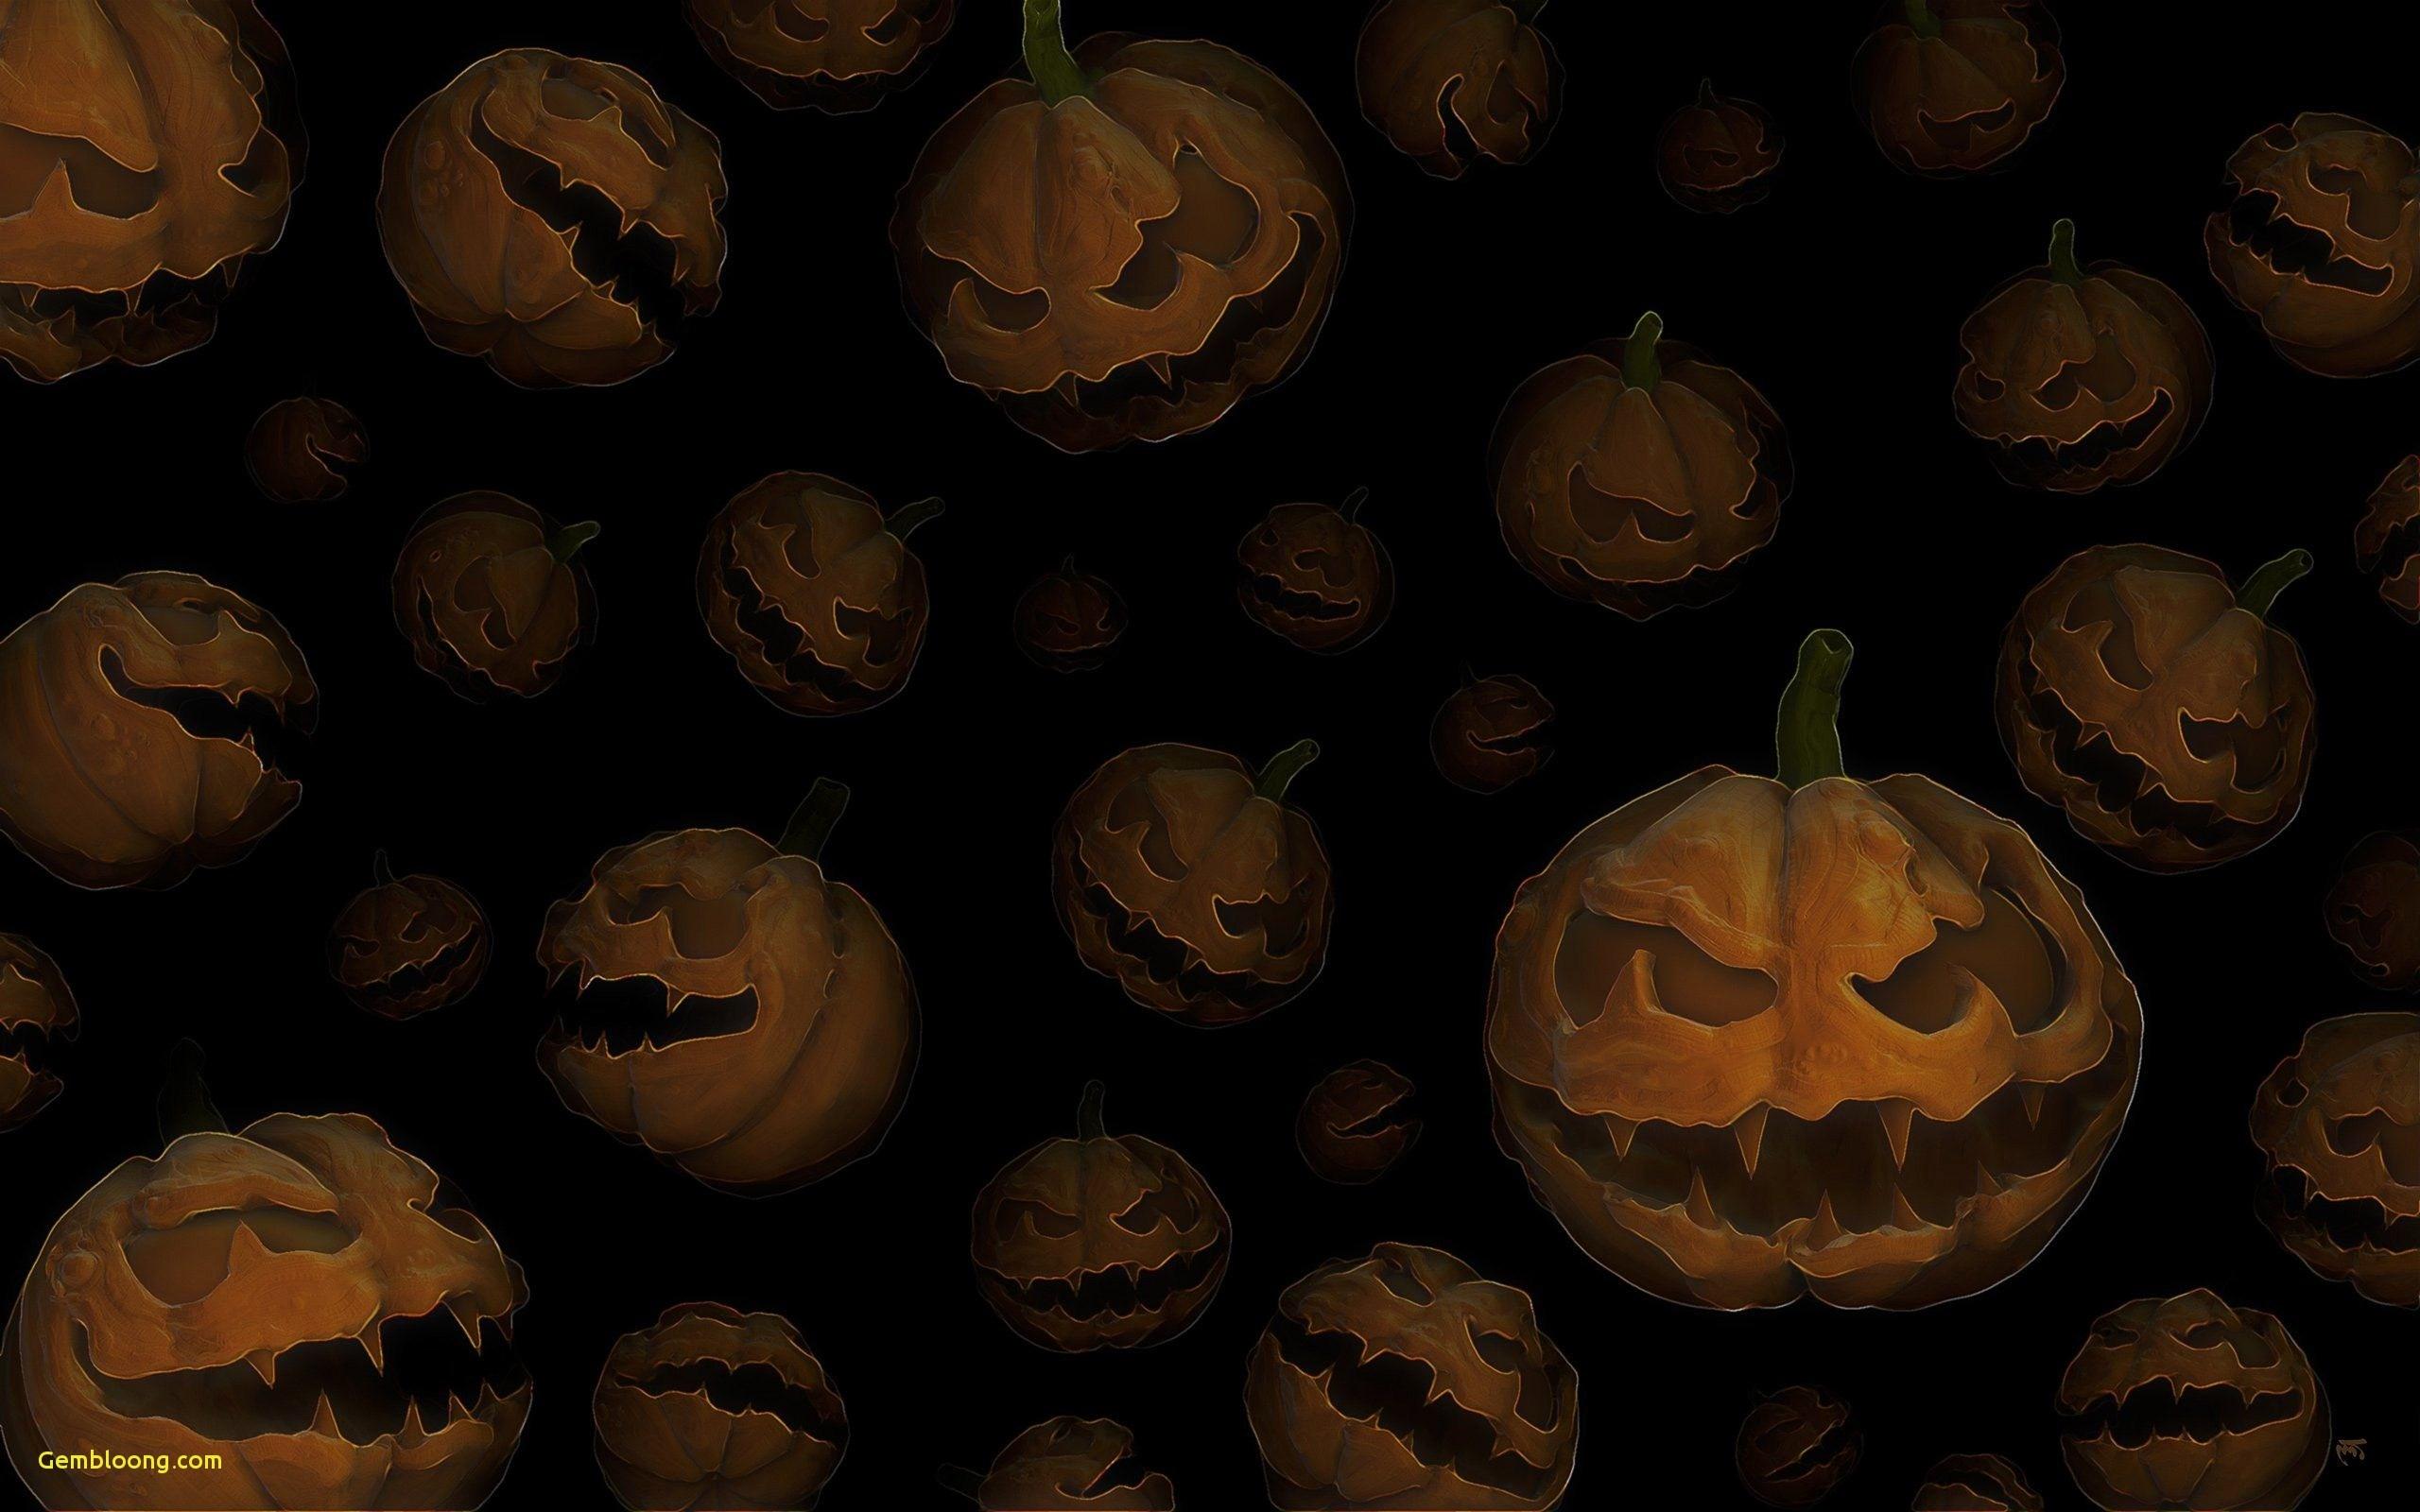 Halloween Pumpkin Wallpaper Tumblr Free Halloween Backgrounds 2560x1600 Wallpaper Teahub Io